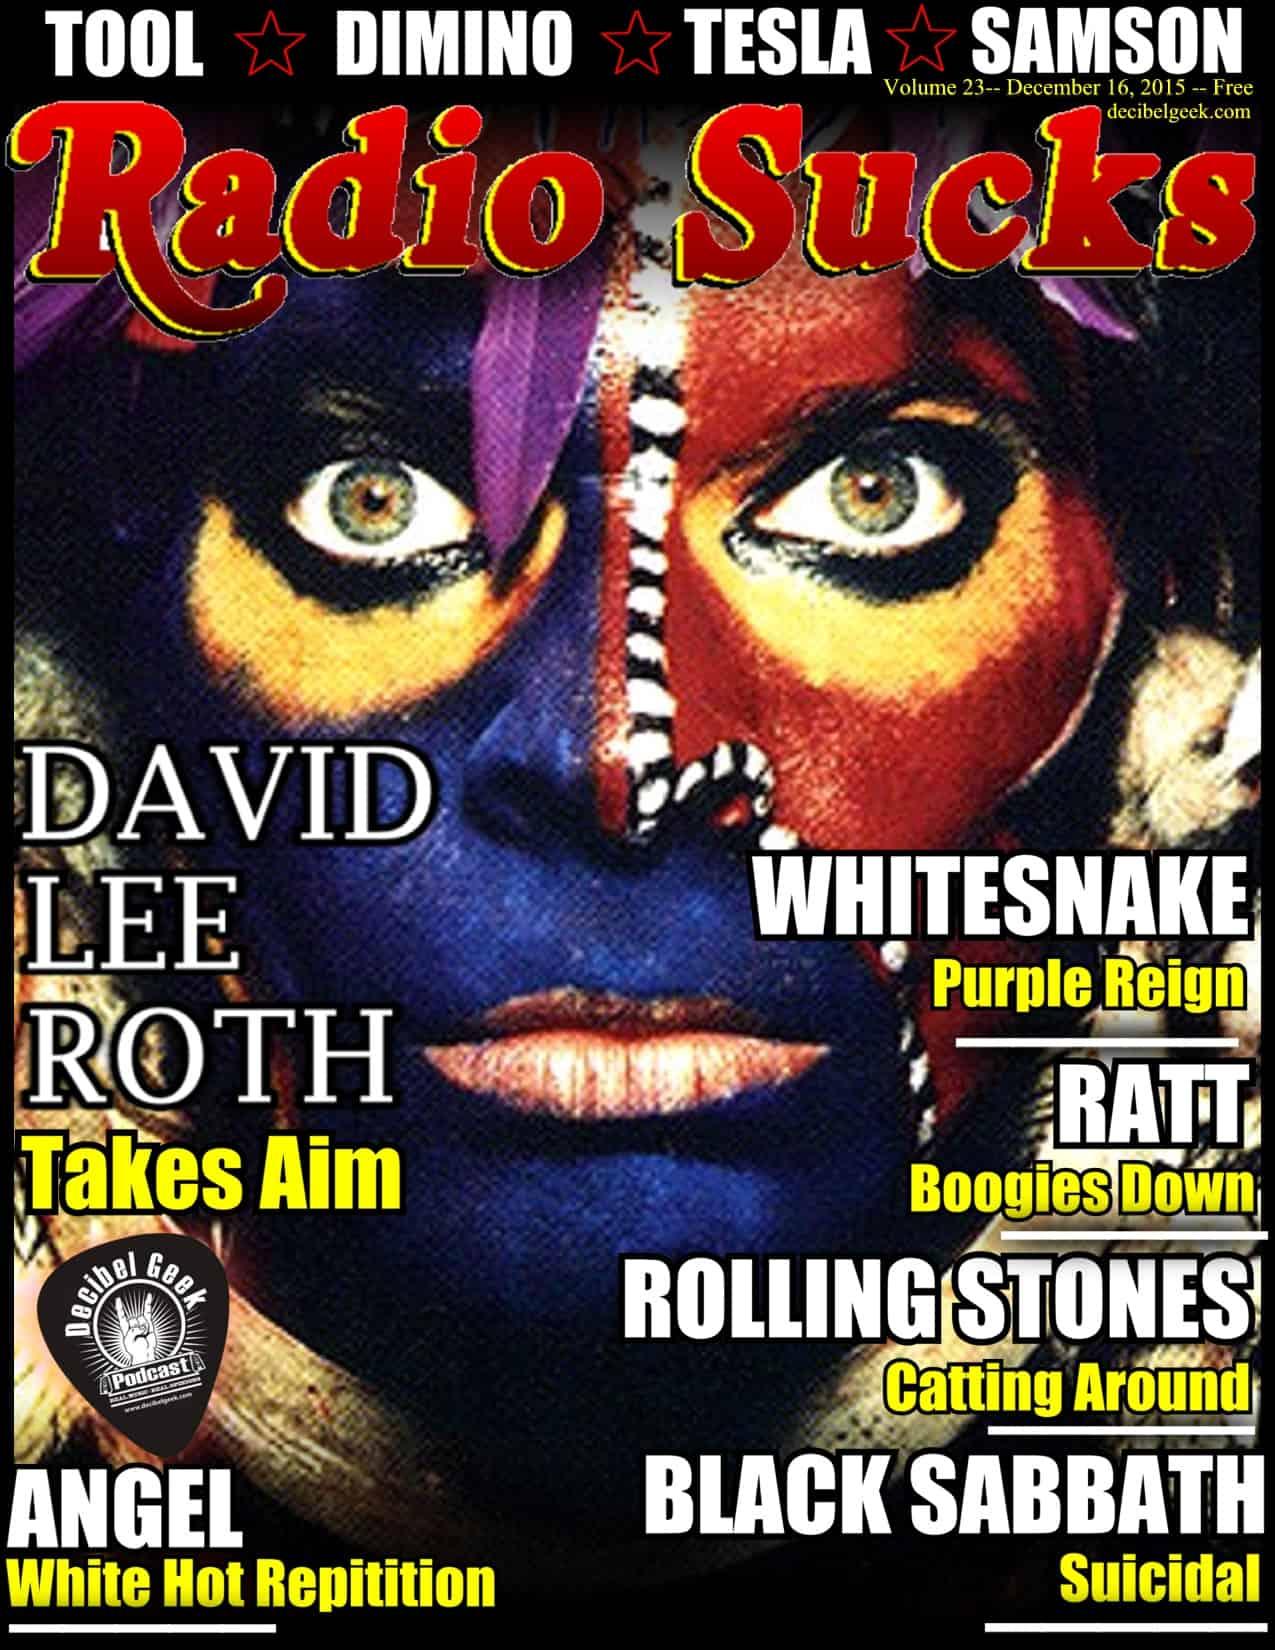 Radio Sucks Radio Show